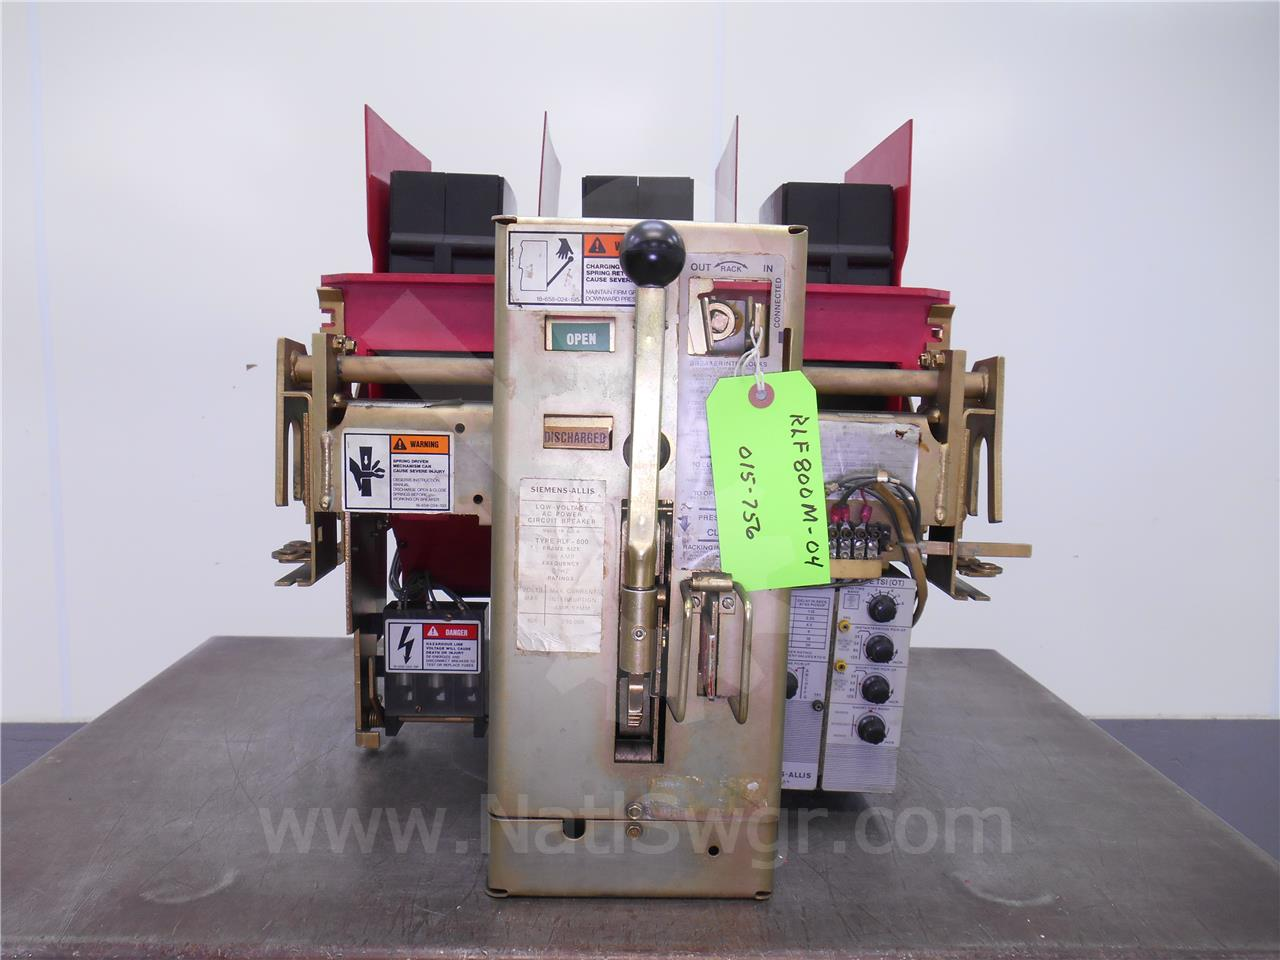 RLF-800 800A Siemens / Allis Chalmers MO/DO STATIC TRIP II TSI (OT), 800A CT